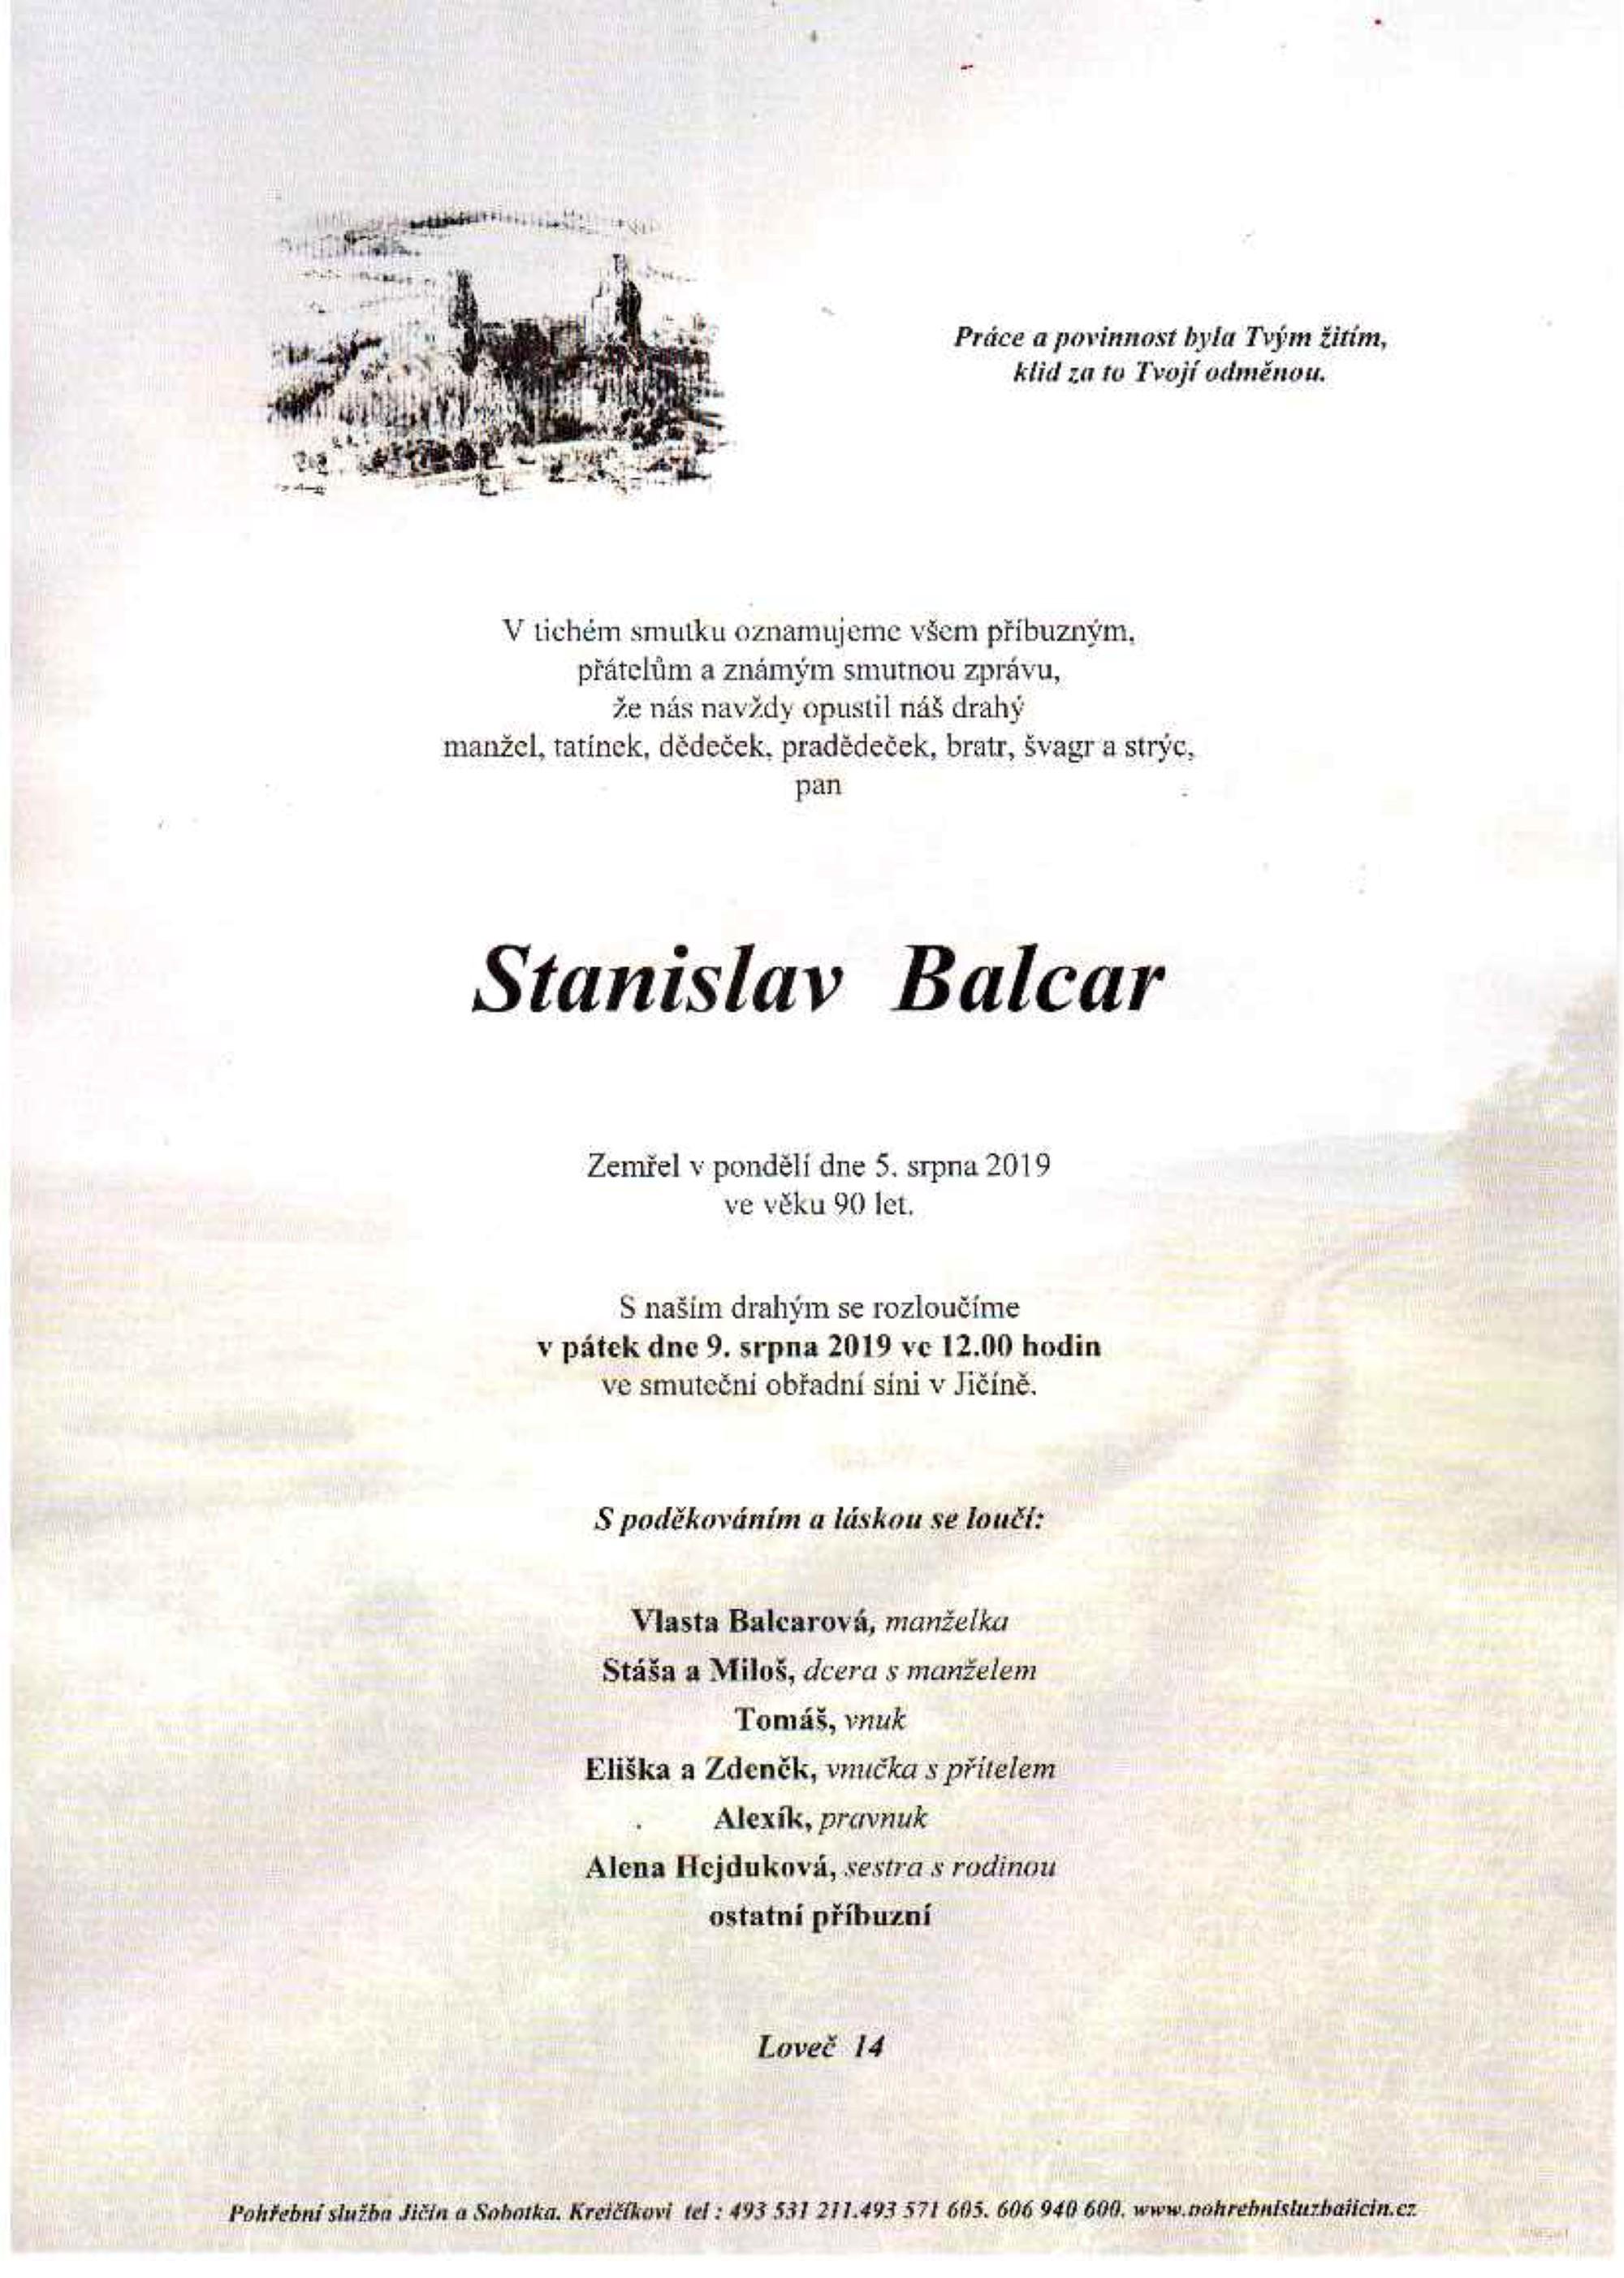 Stanislav Balcar